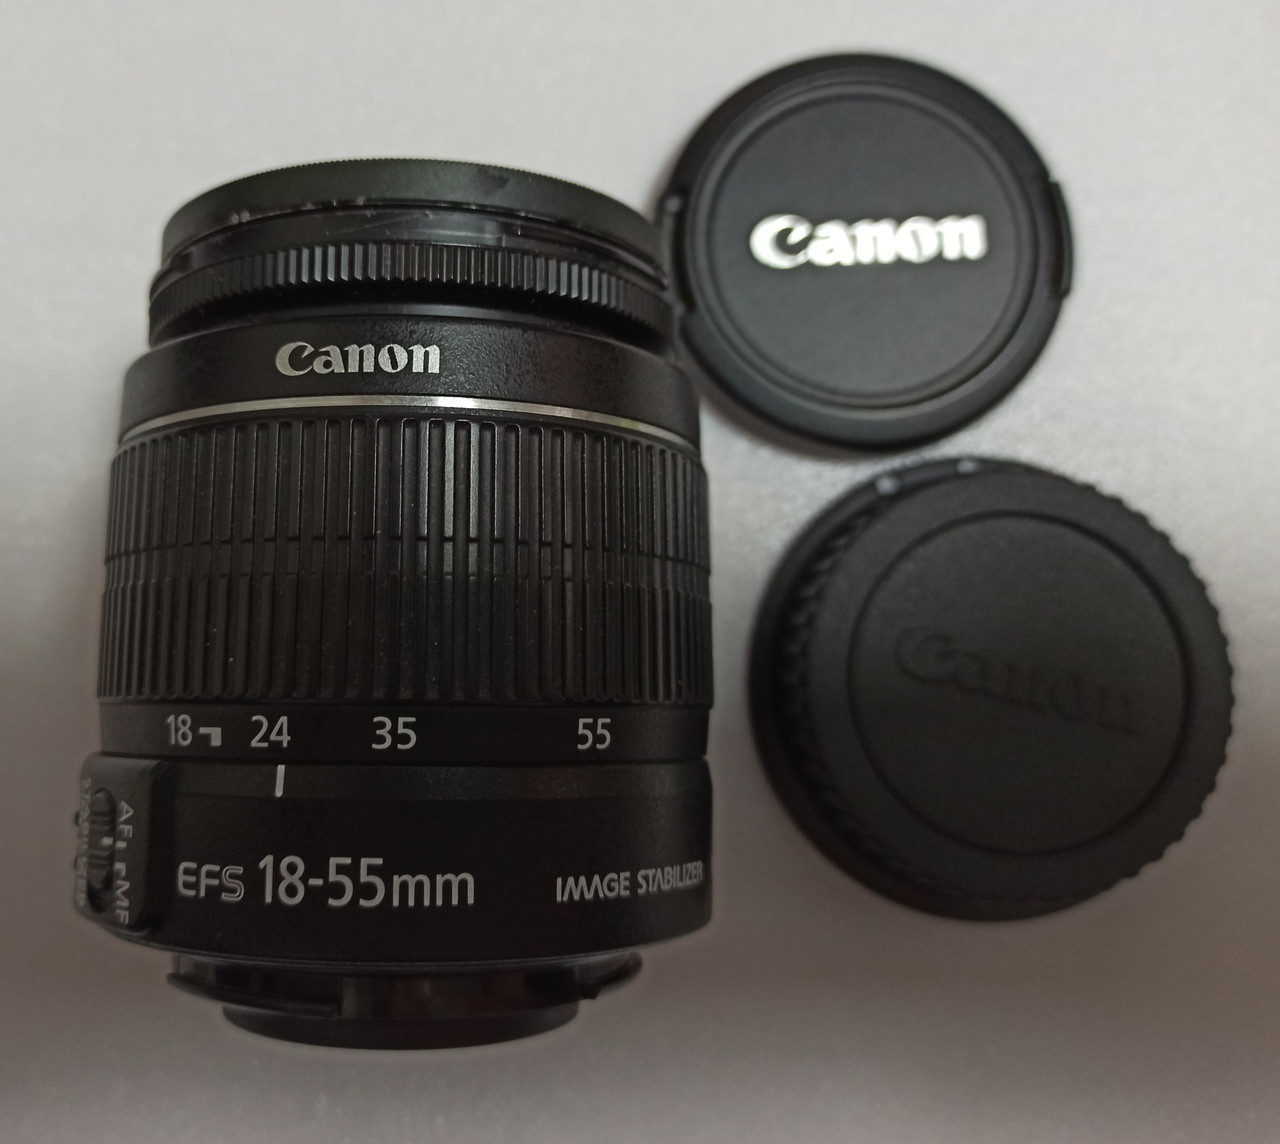 Об'єктив Canon EF-S 18-55mm 1:3.5-5.6 IS II друге покоління